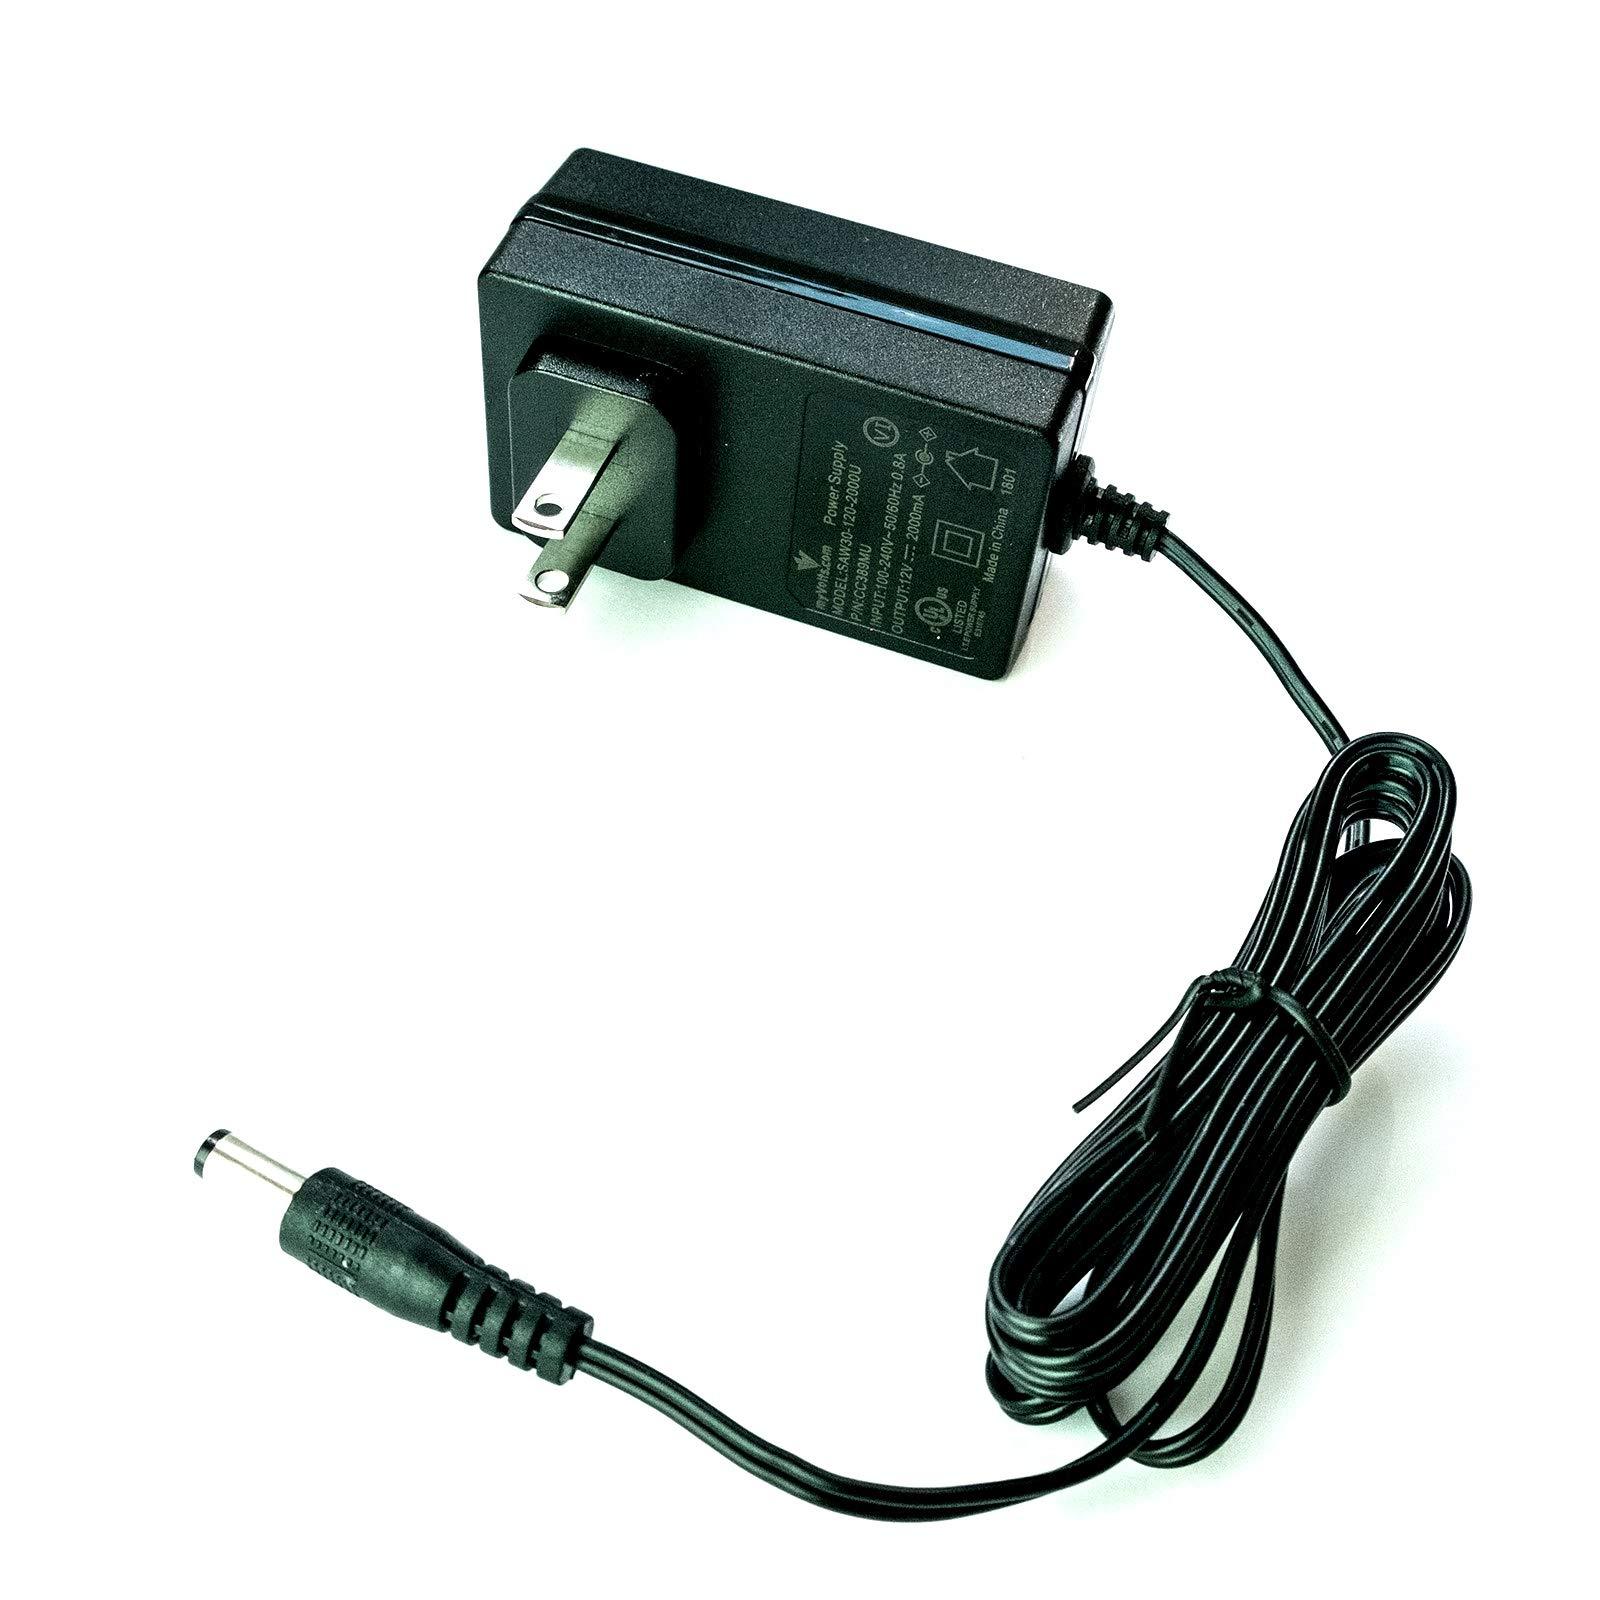 12V Western Digital Easystore 8TB USB 3.0 External hard drive replacement power supply adaptor - US plug